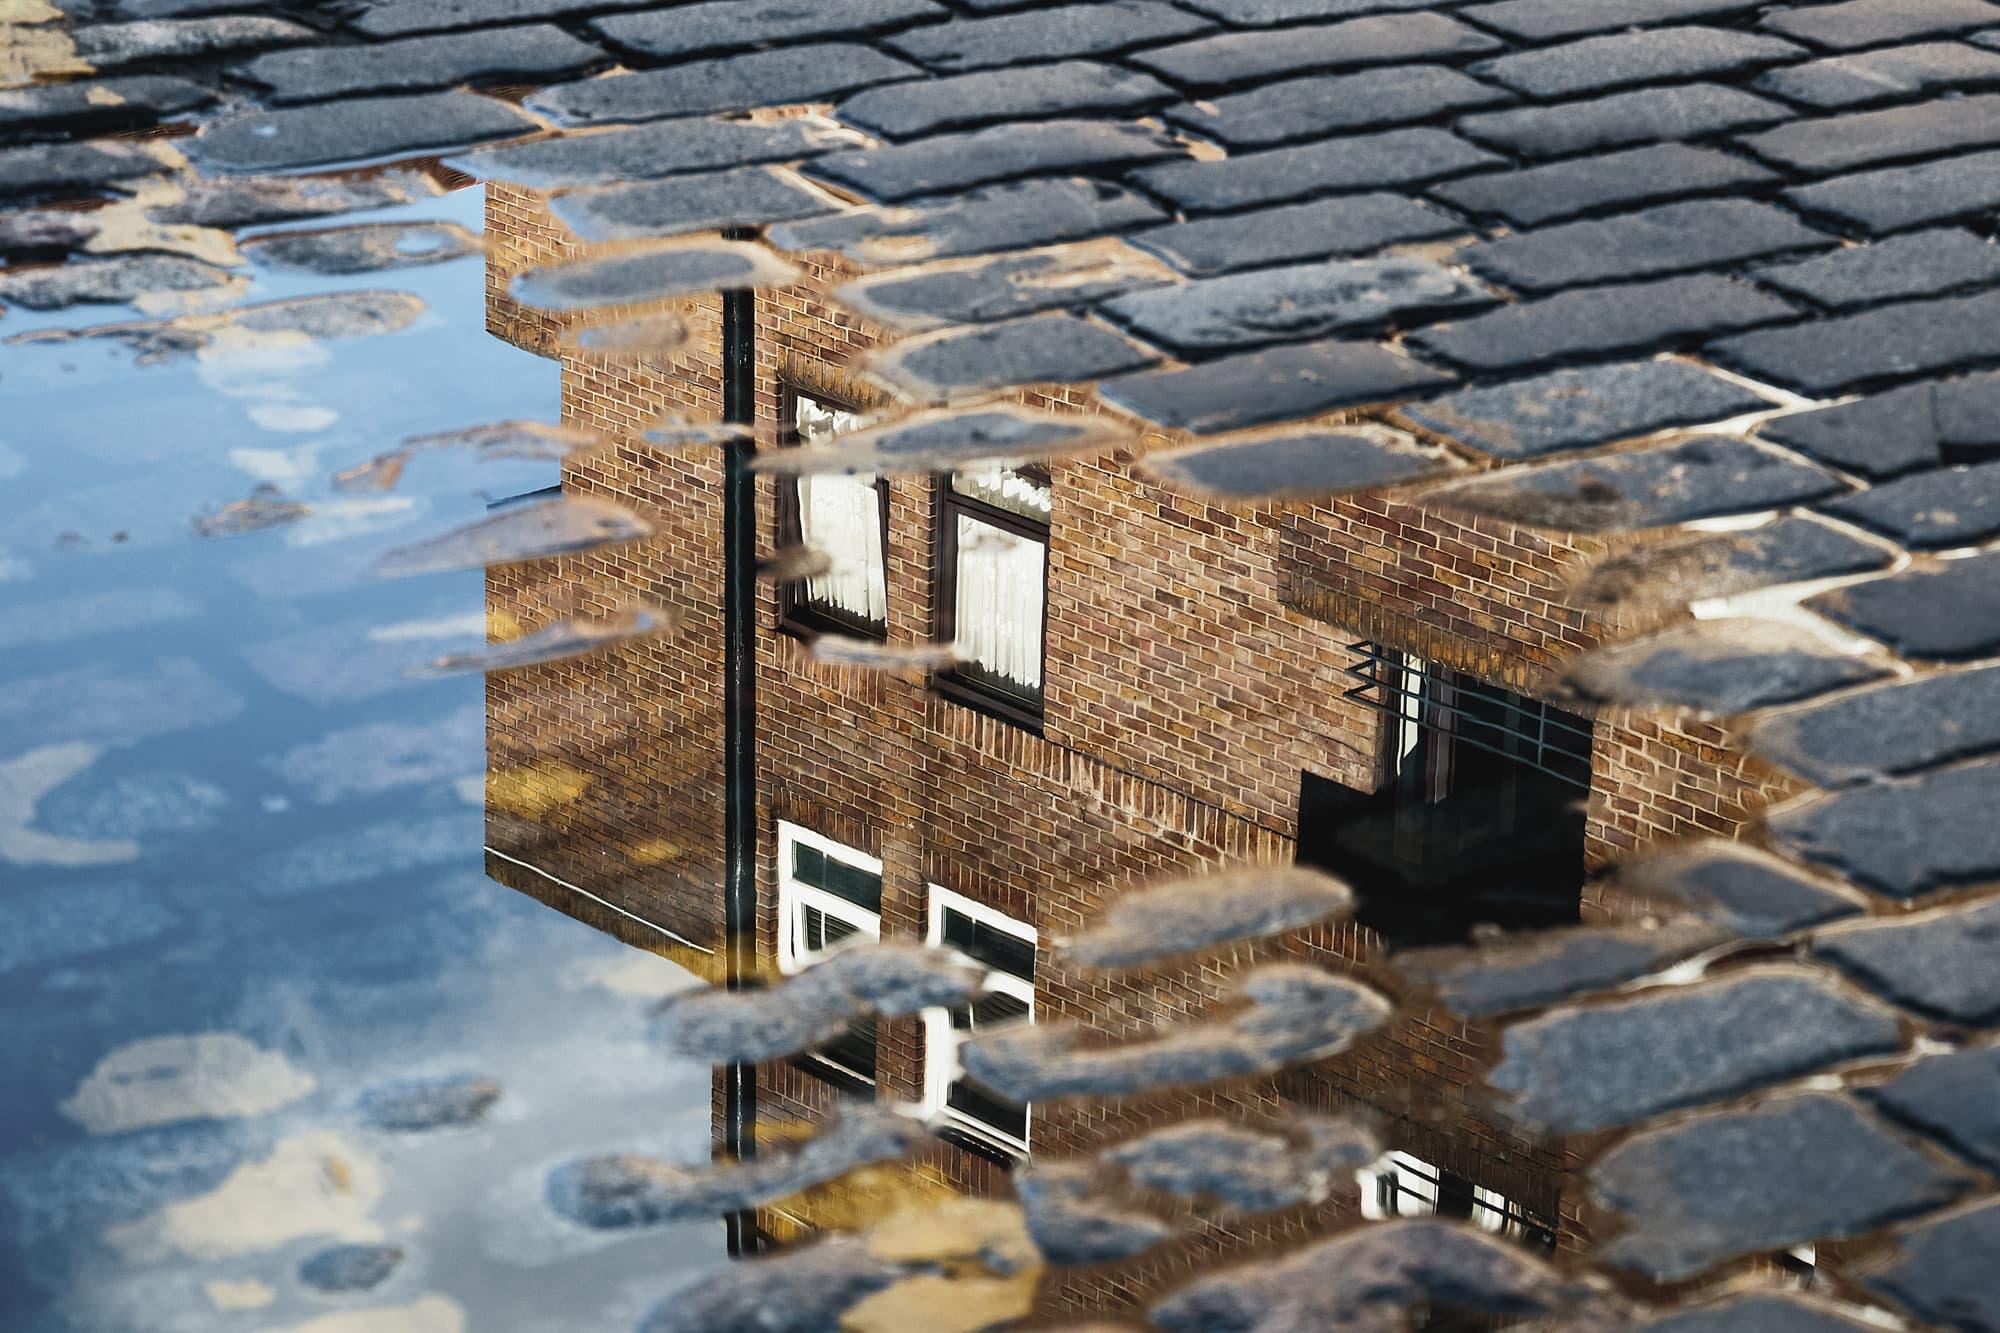 cobblestone-reflection-house-puddle-after-rain